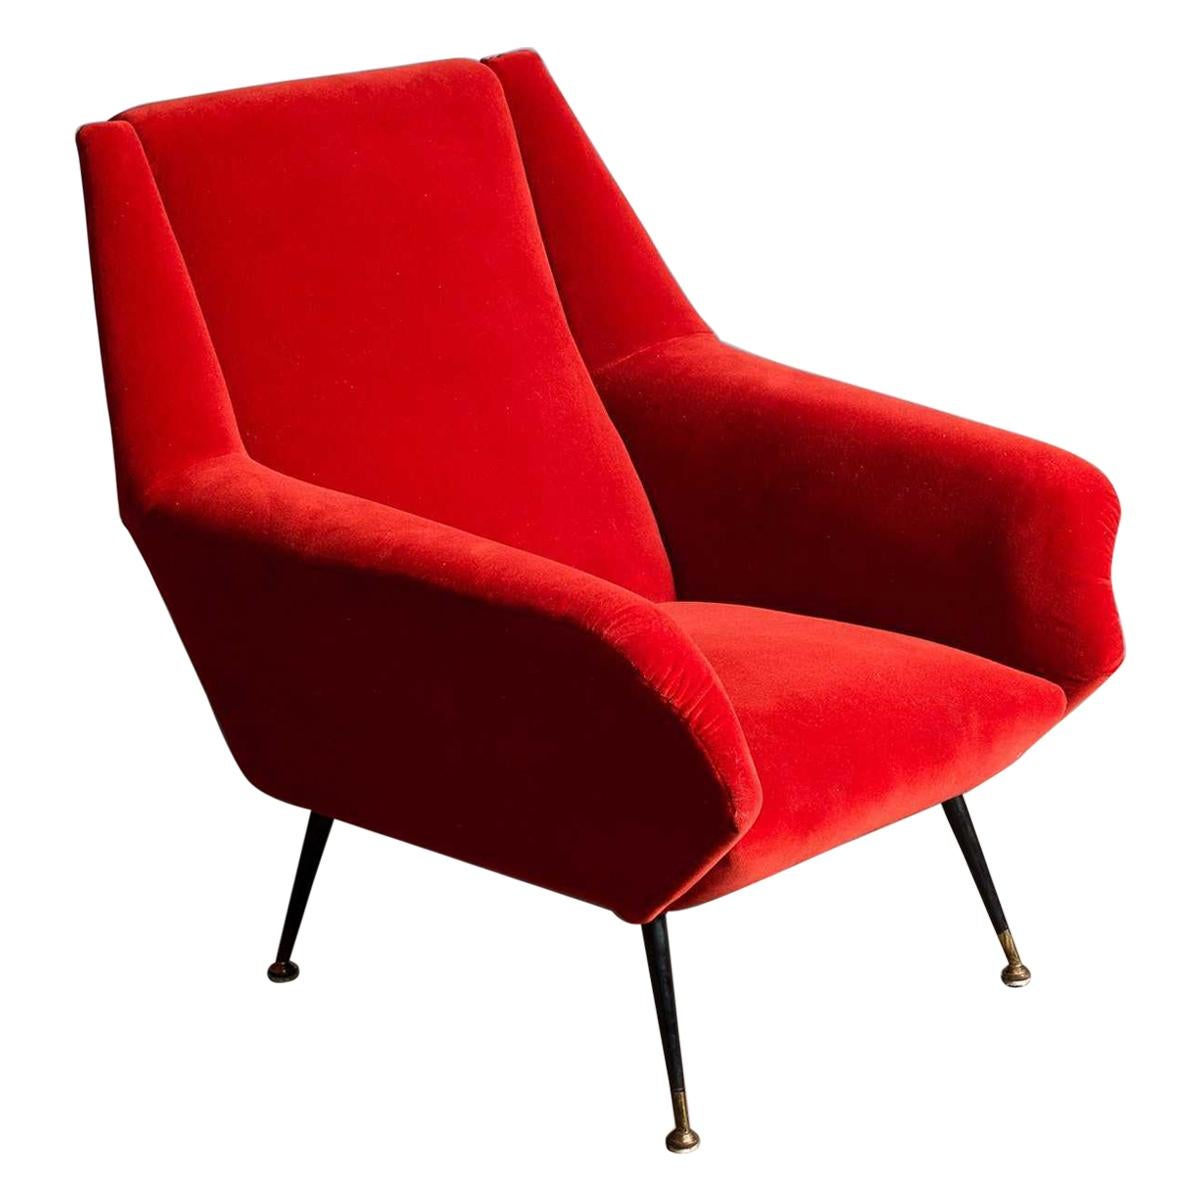 1950s Italian Armchair, Red